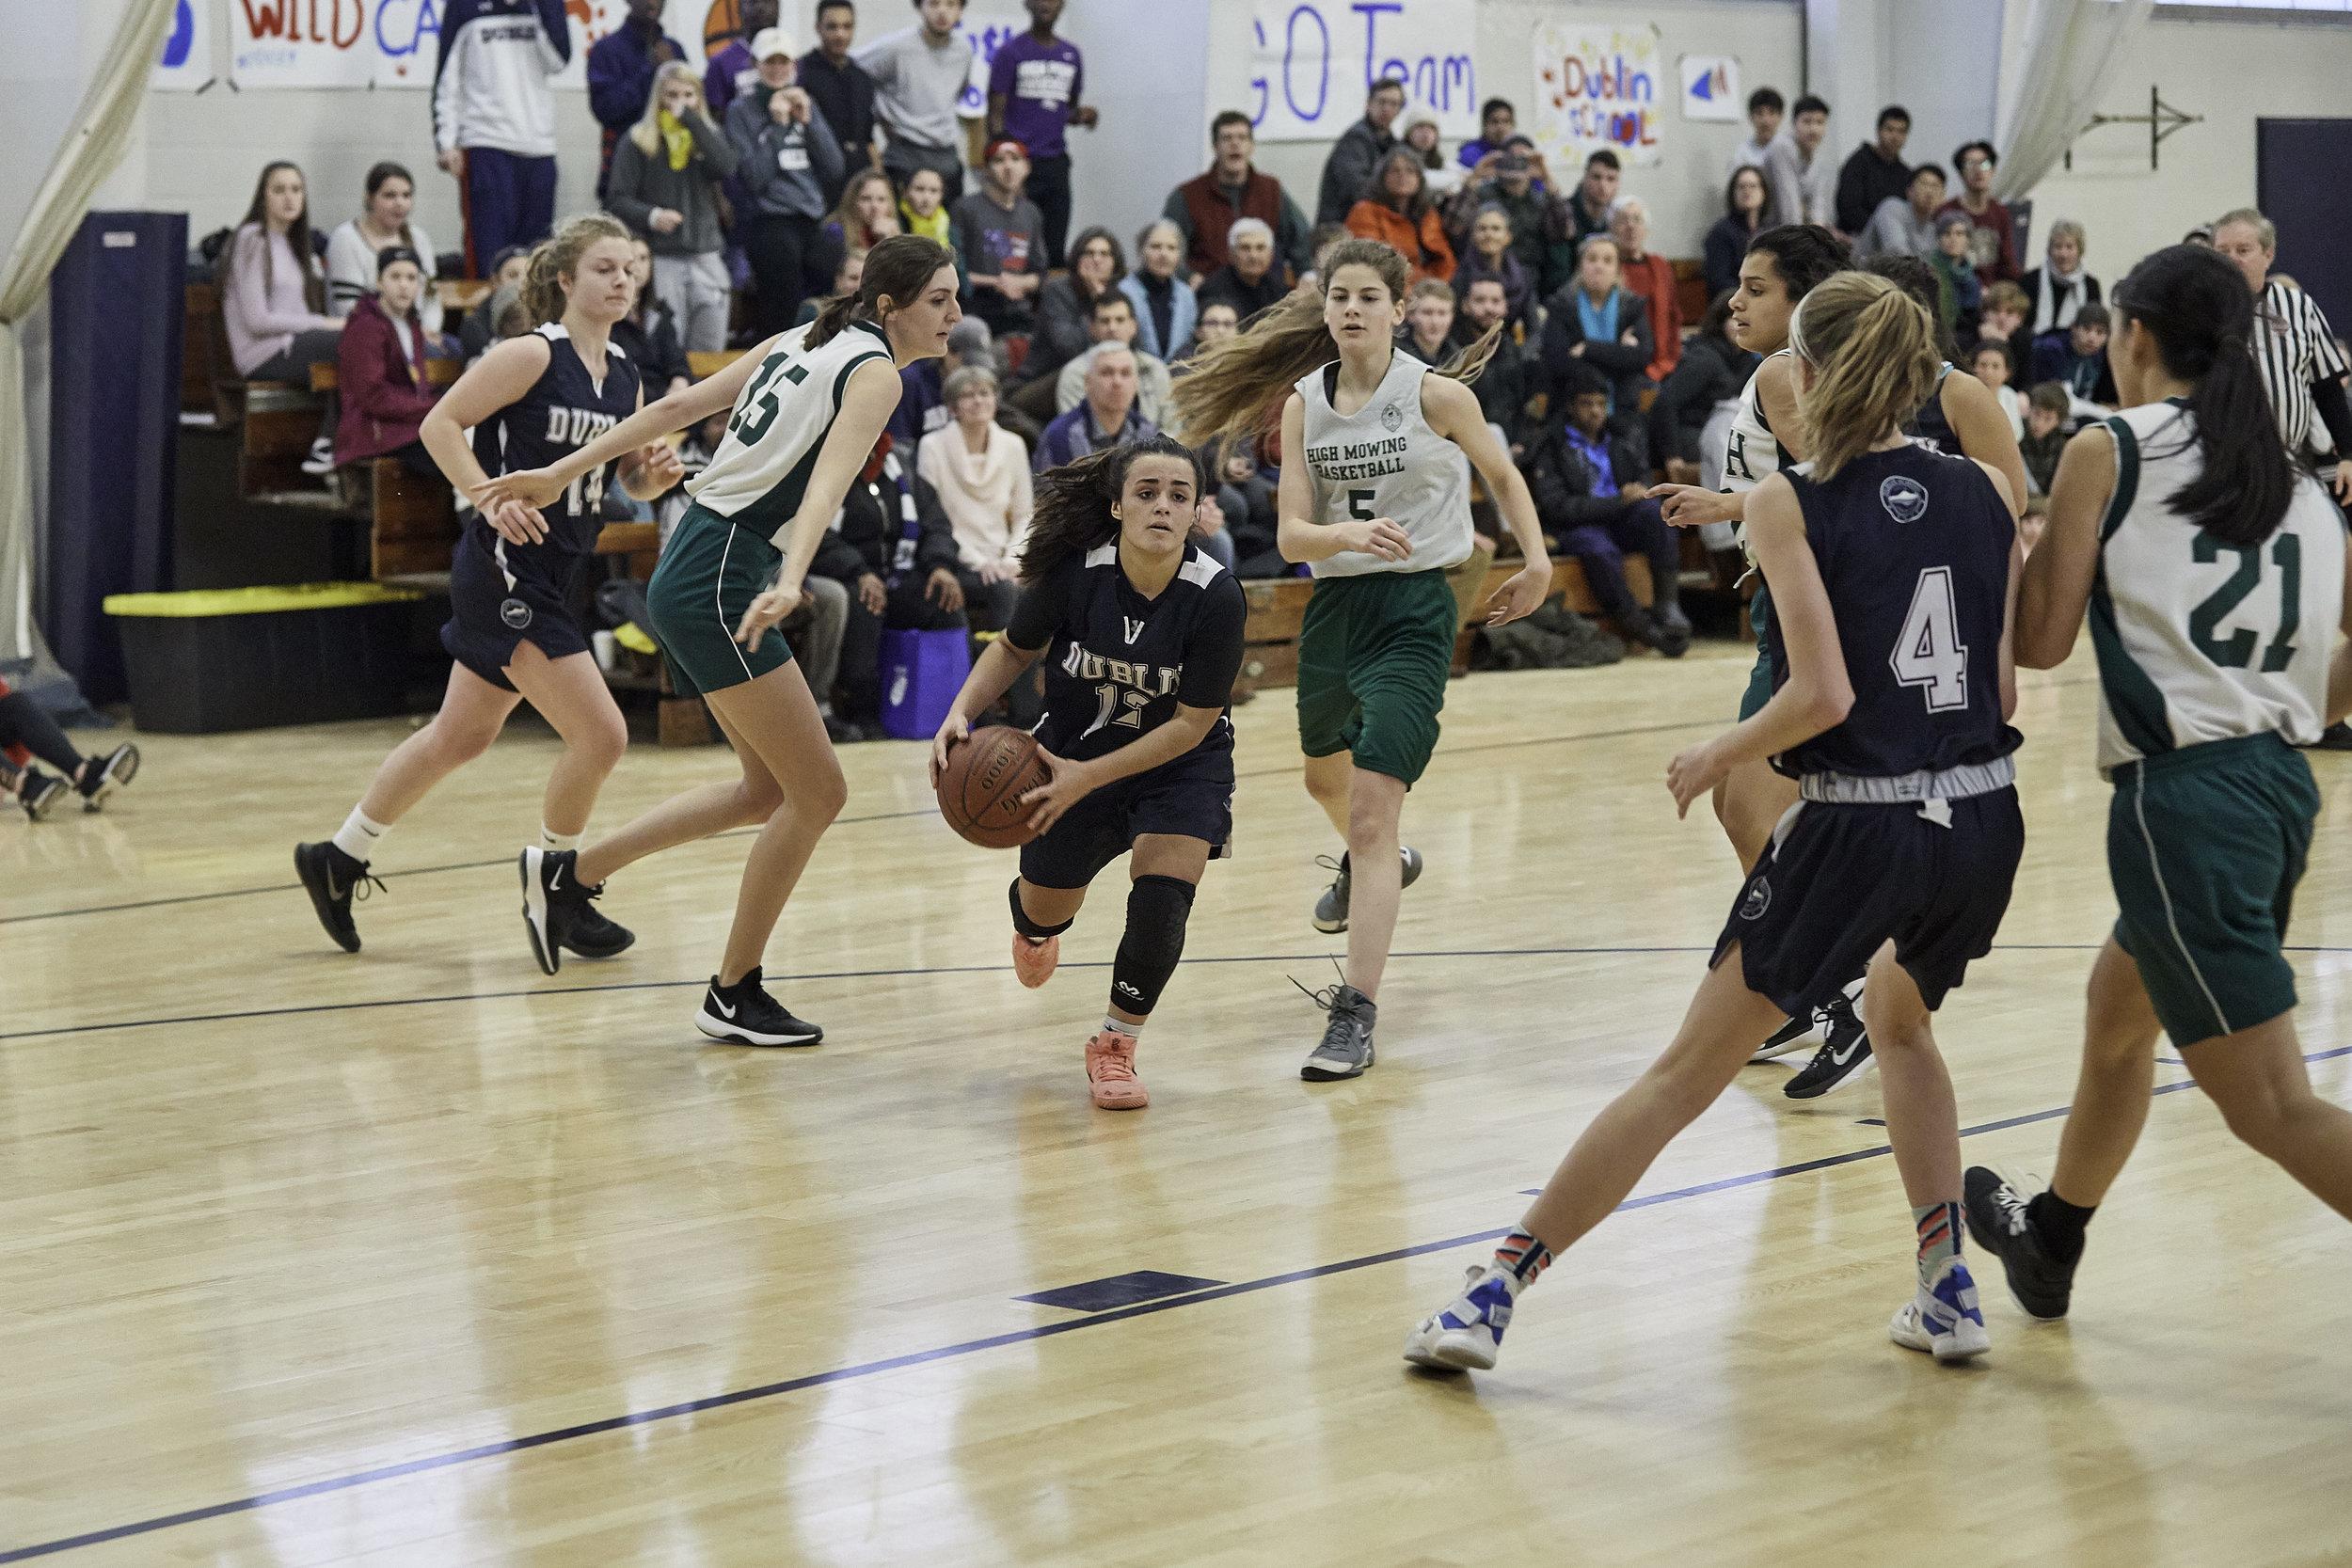 Basketball vs High Mowing School, February 2, 2019 - 166536.jpg